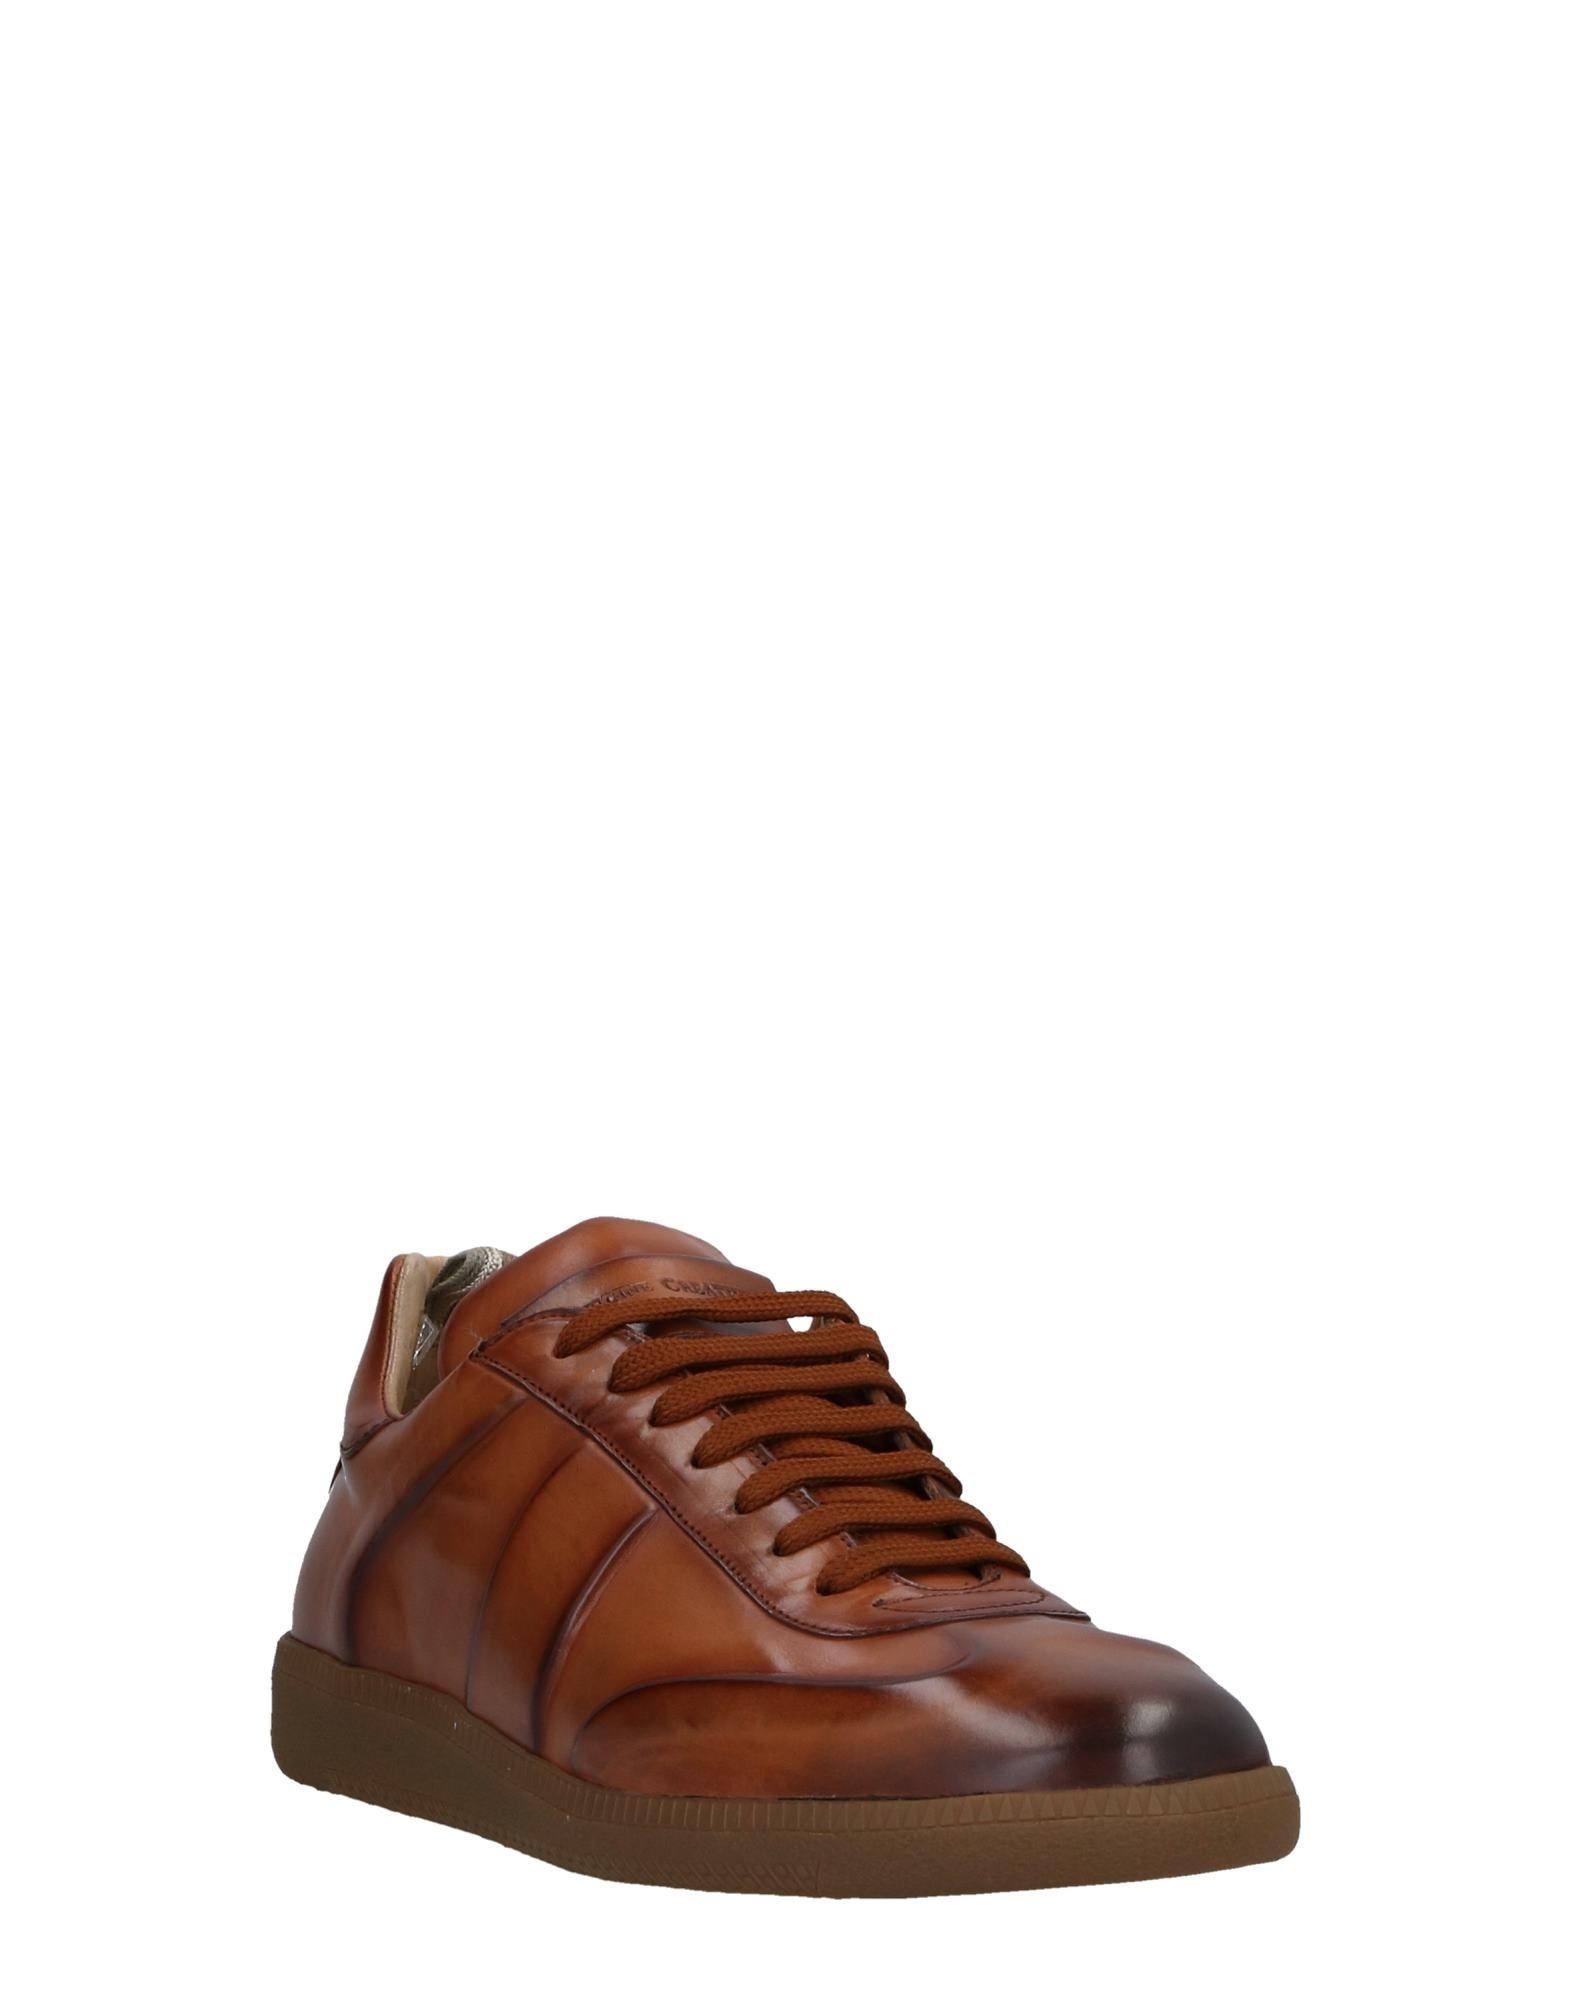 Officine Creative Italia Sneakers Herren Schuhe  11513145JS Neue Schuhe Herren 6ee754